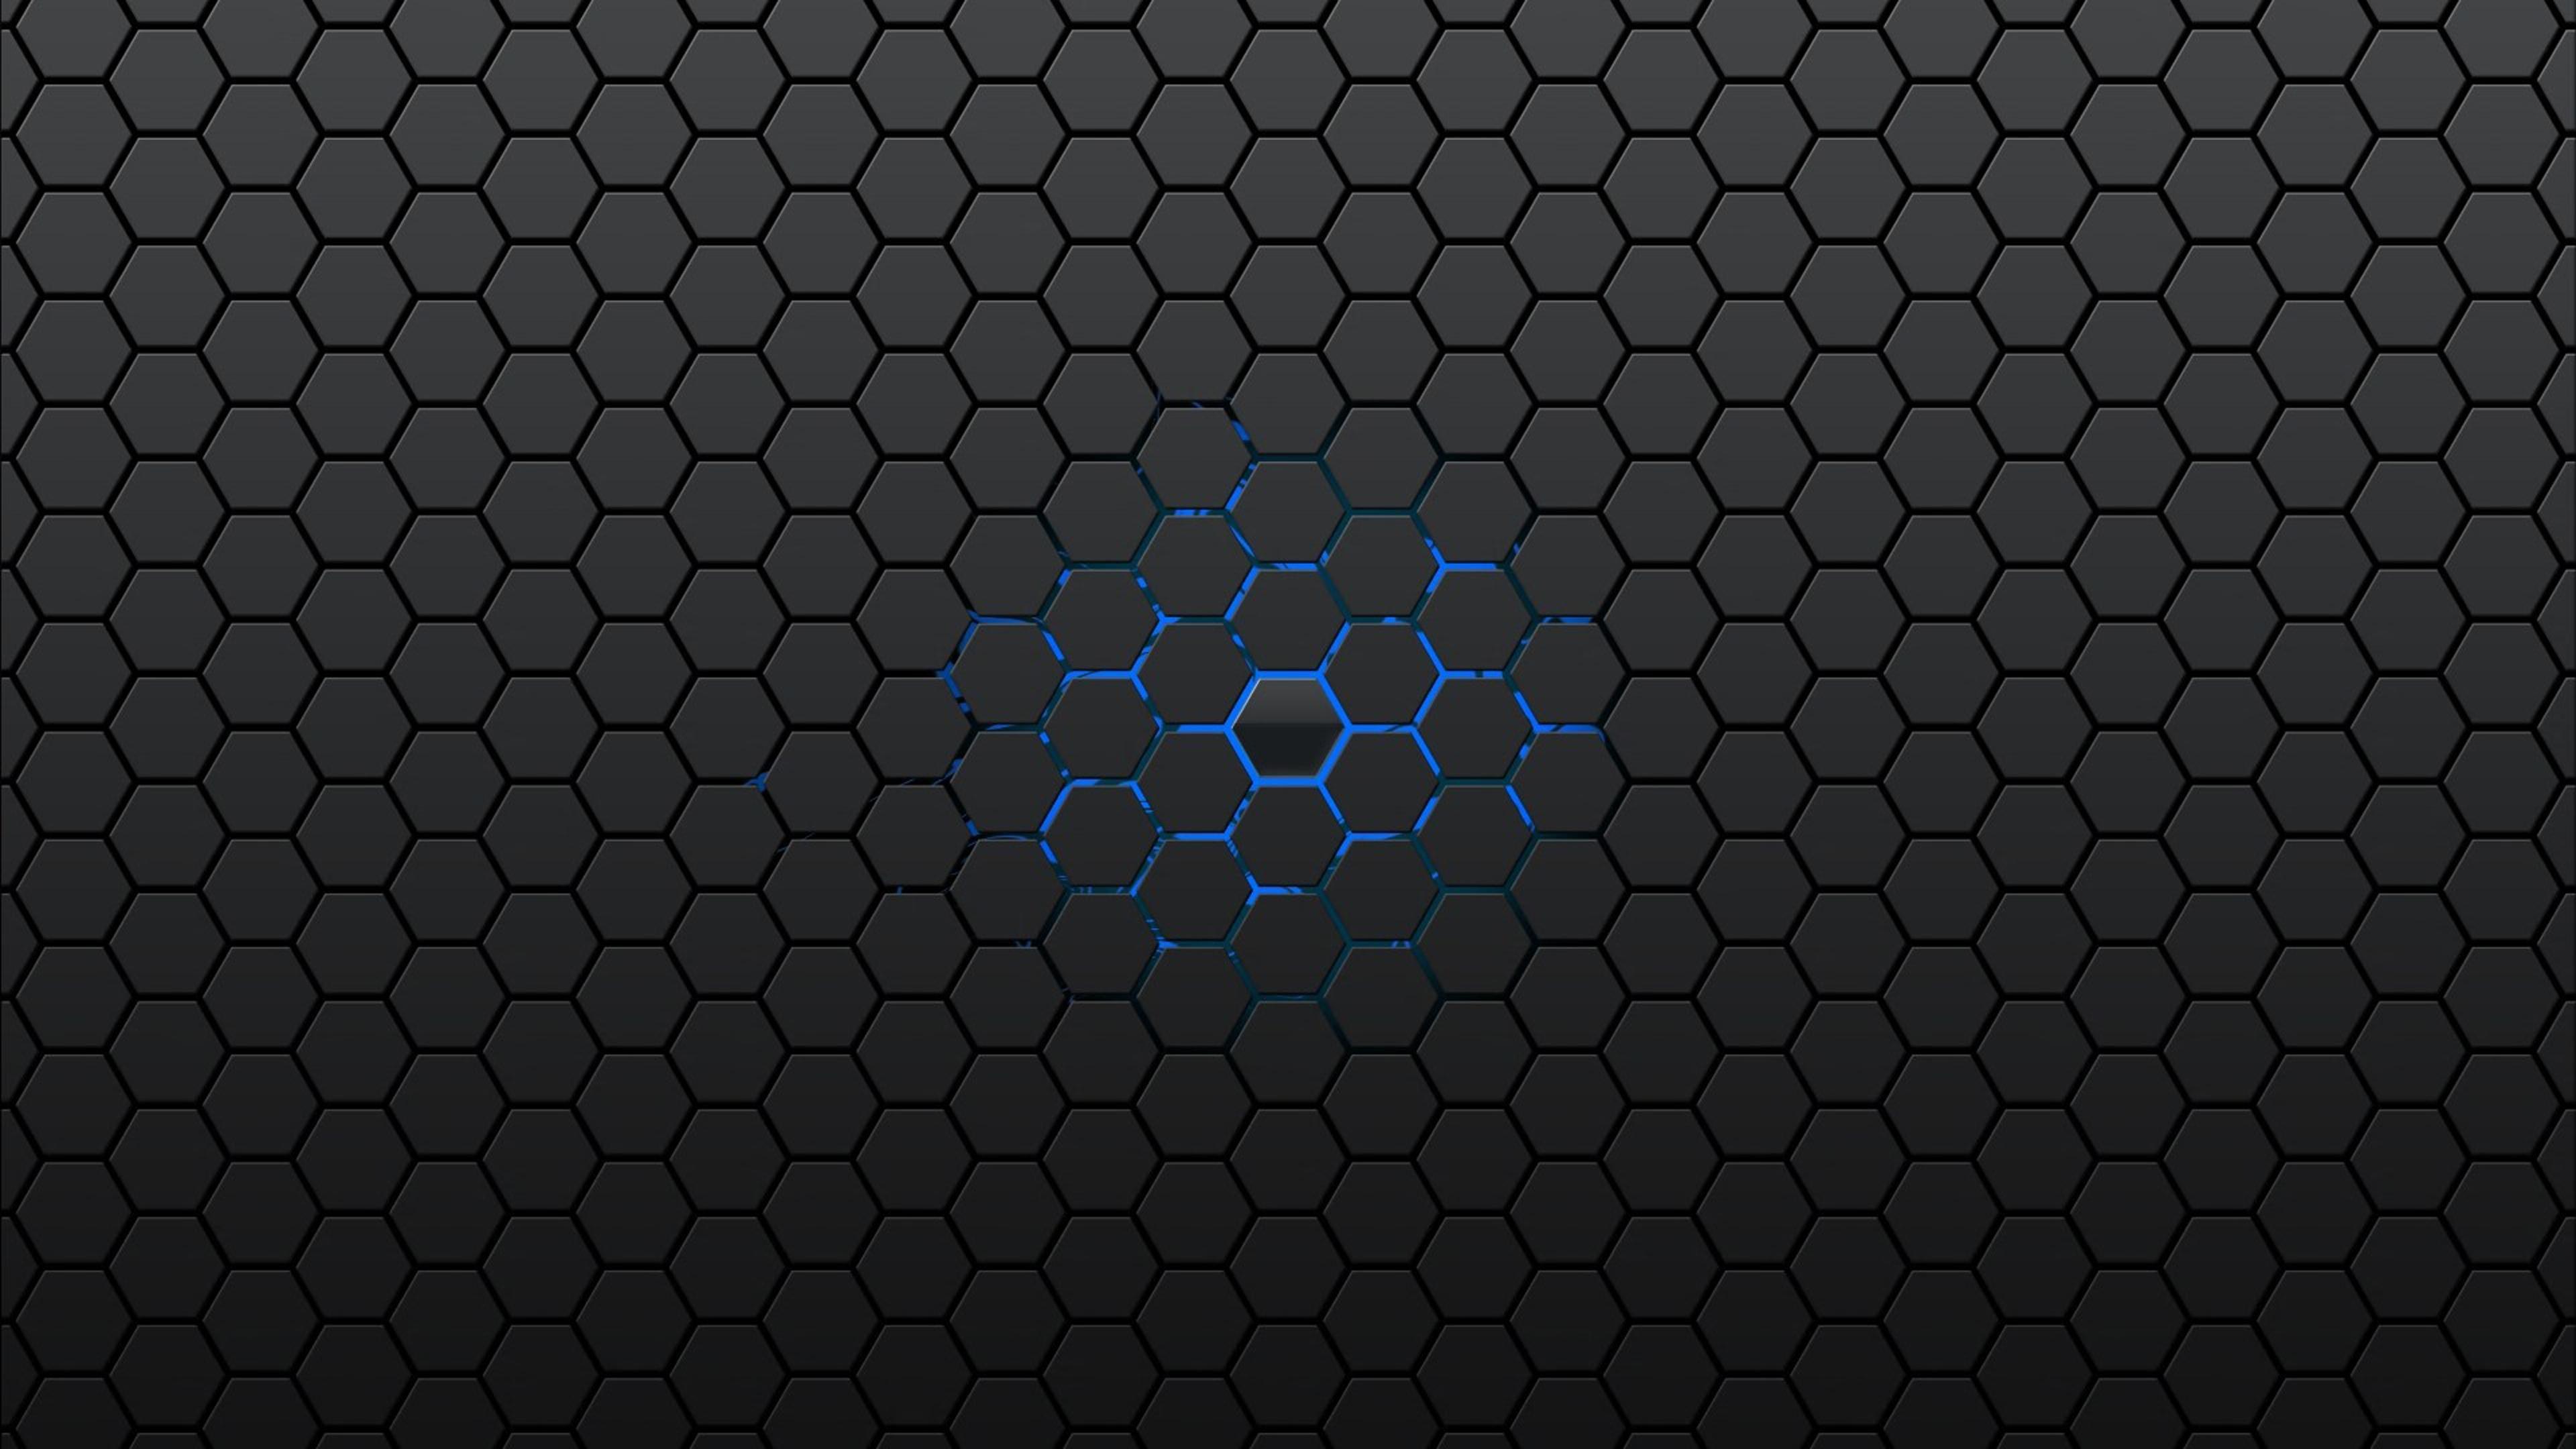 Wallpaper Ultra Hd 4k Black 442973 Hexagon Wallpaper Honeycomb Wallpaper Abstract Wallpaper